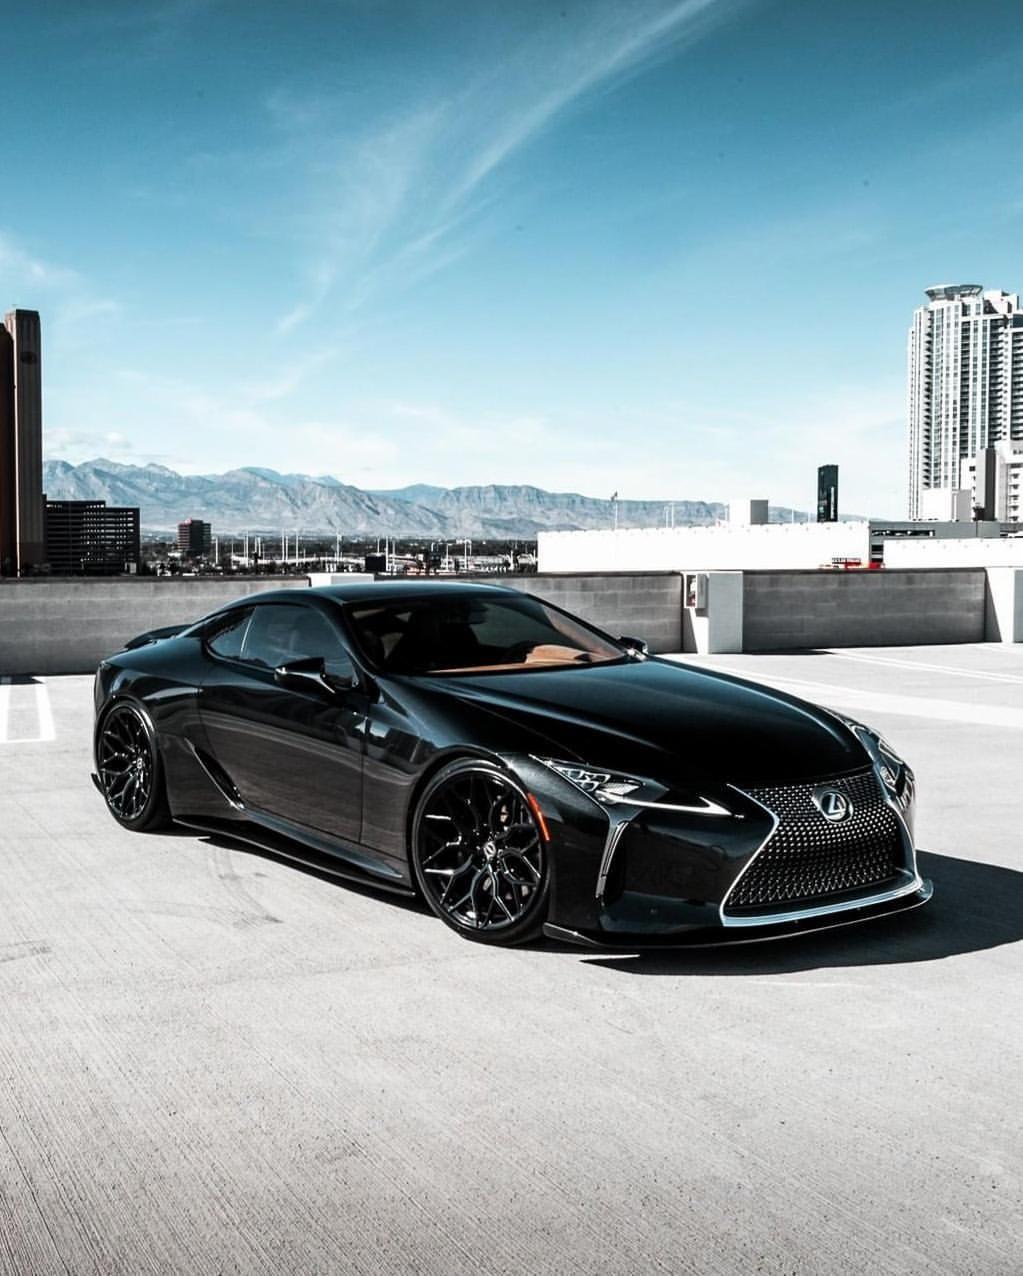 Newport LexusはInstagramを利用しています:「We're Probably Going To